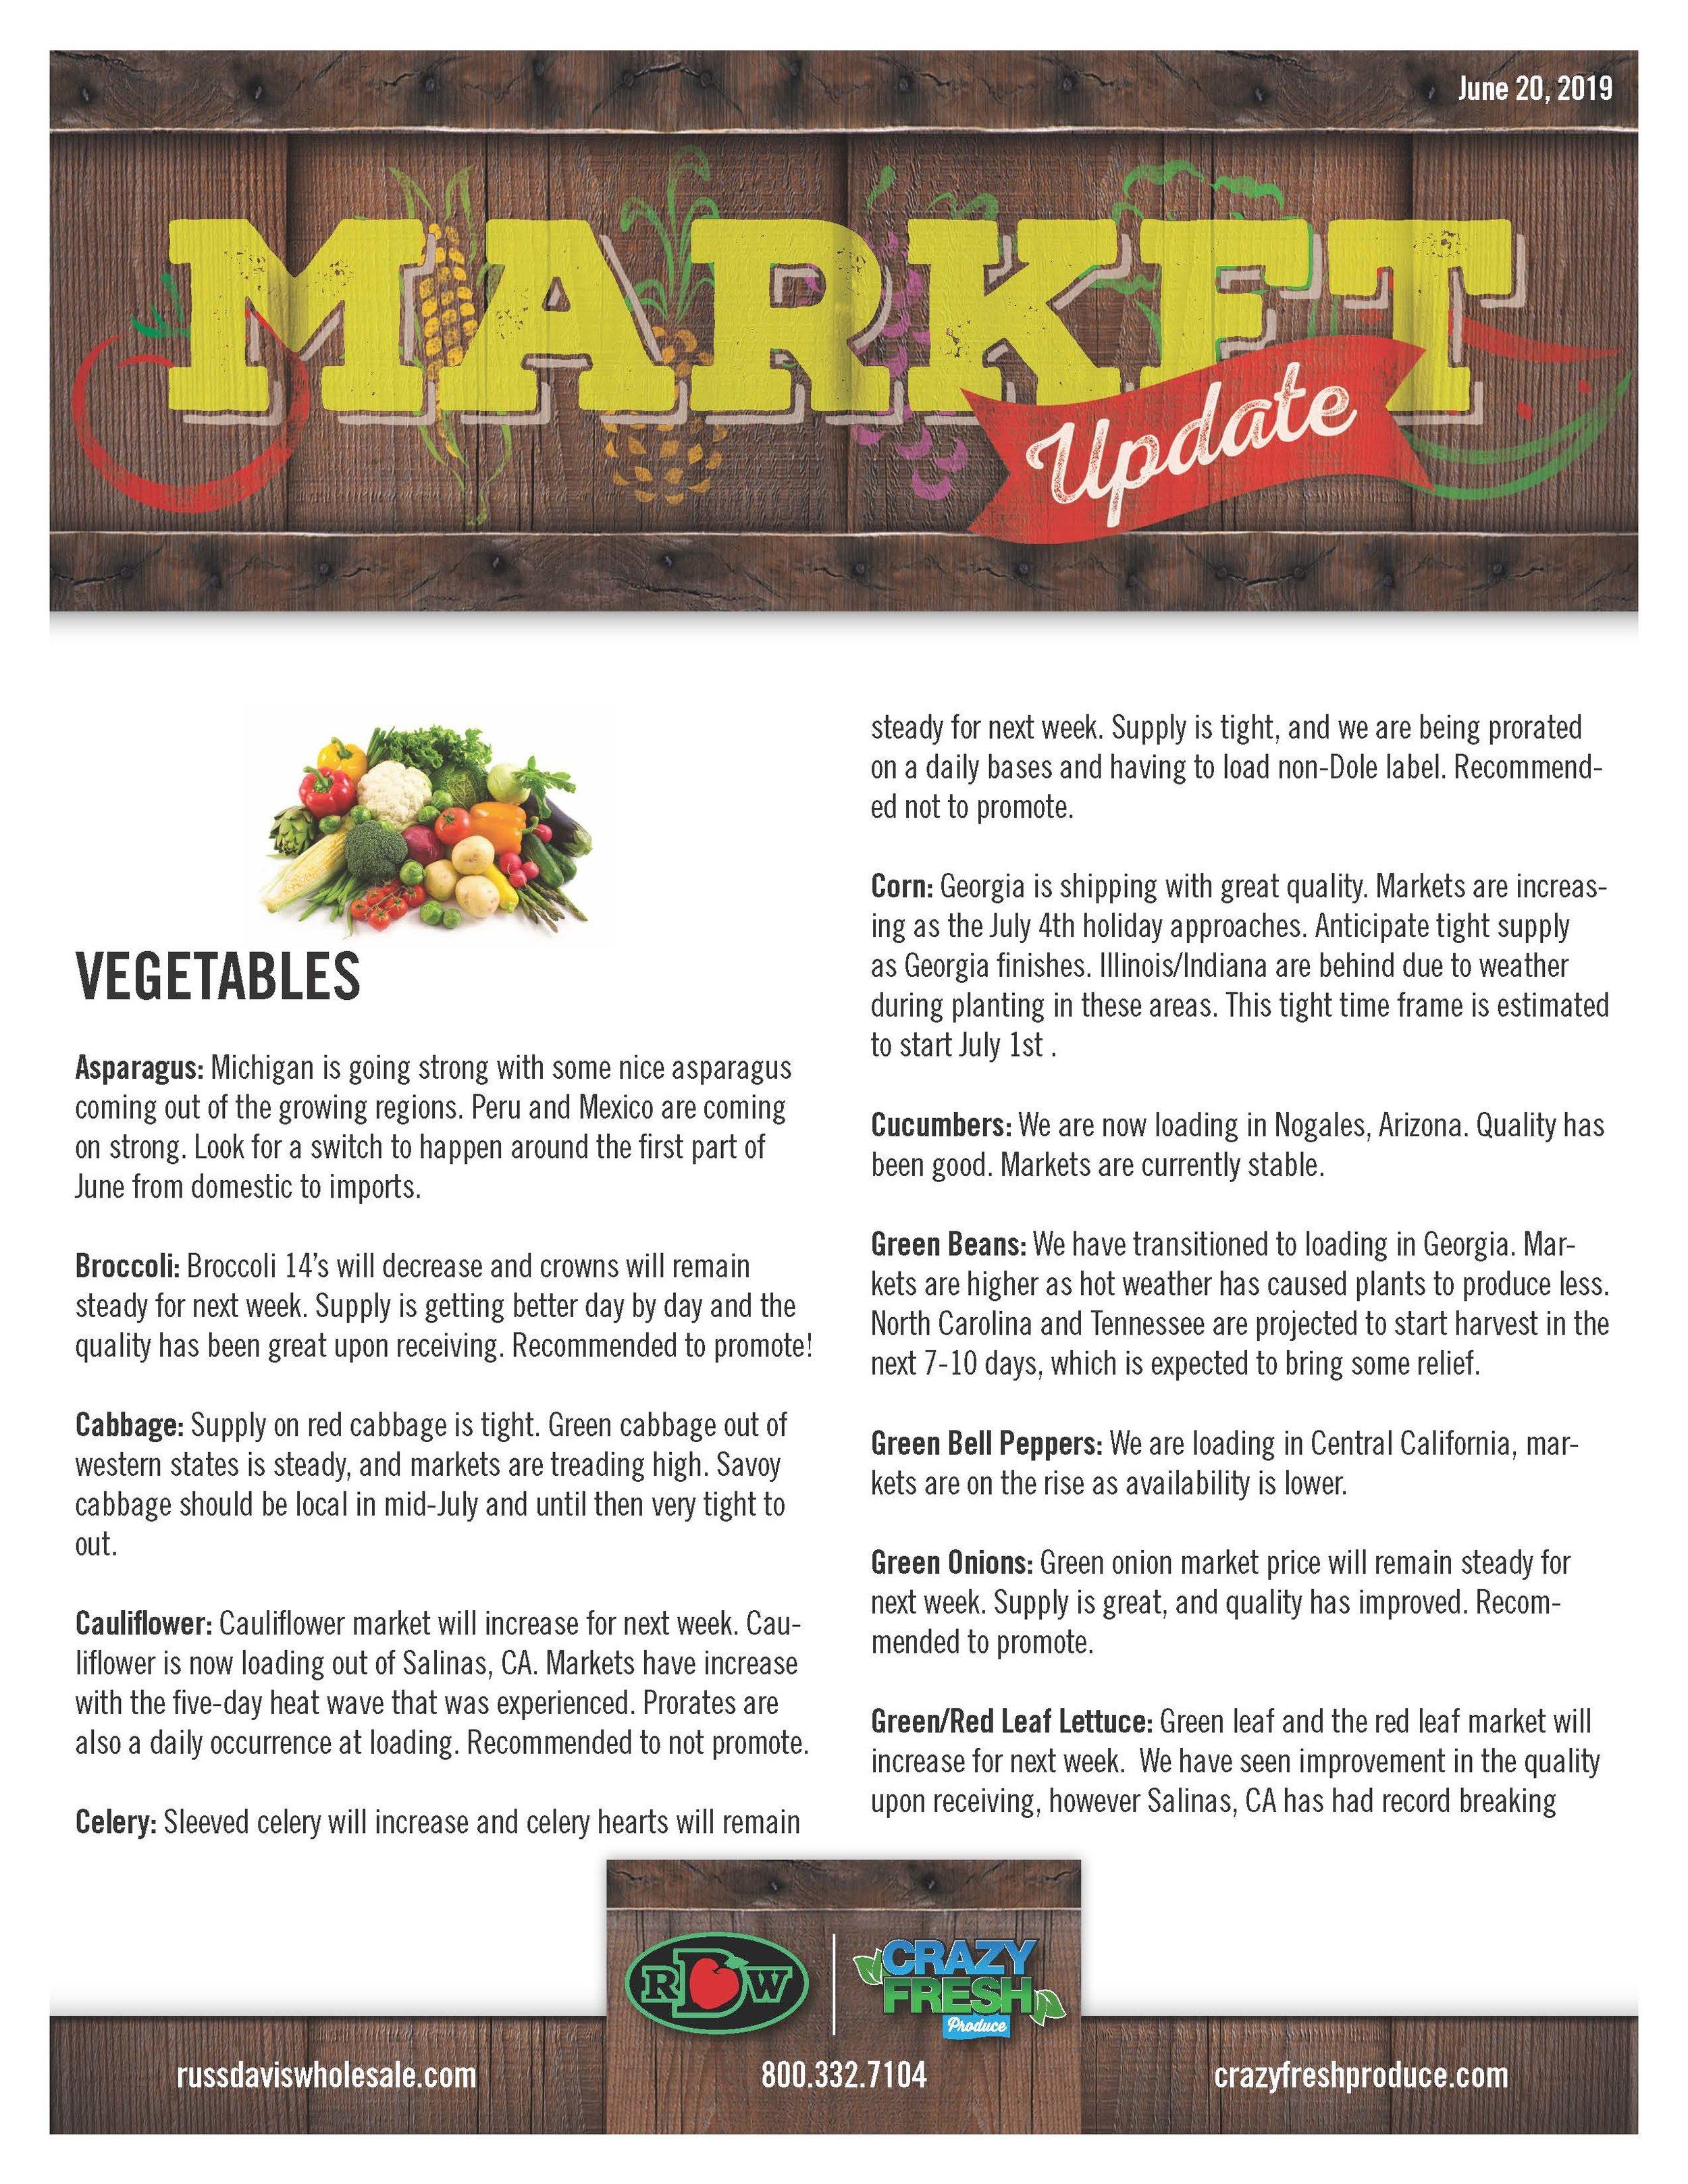 RDW_Market_Update_June20_19_Page_1.jpg